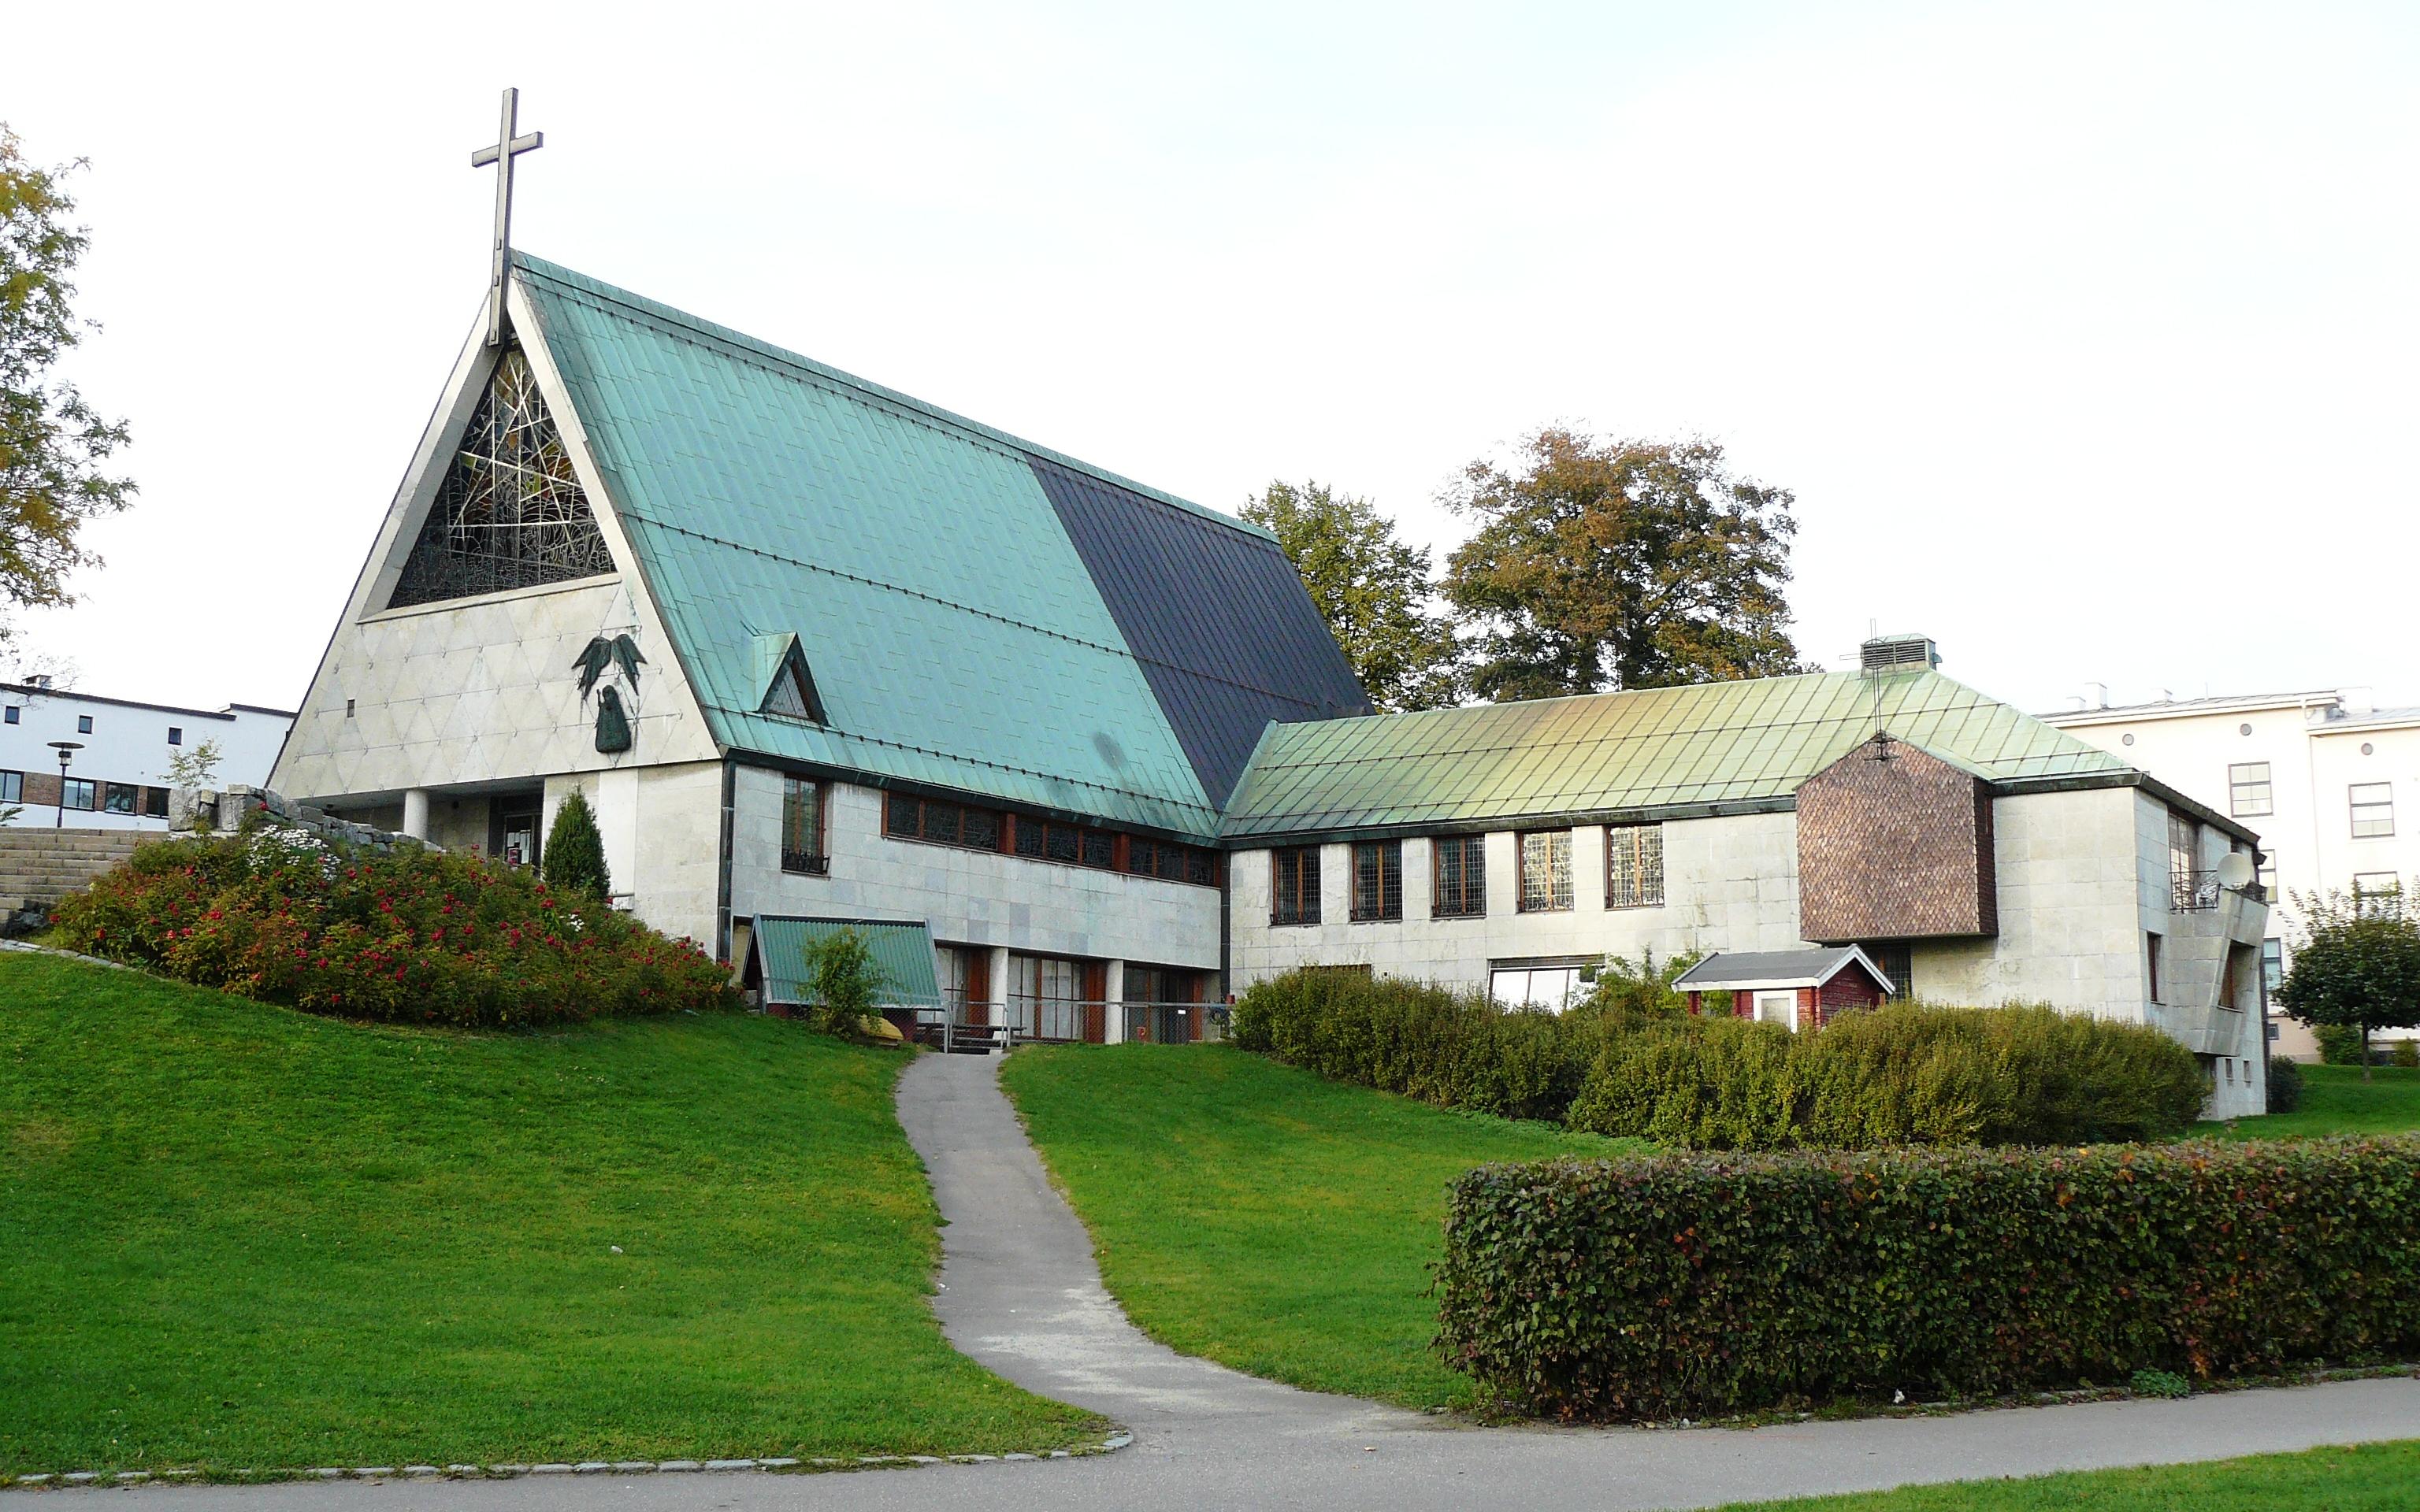 File:Torshov kirke 1.jpg - Wikimedia Commons